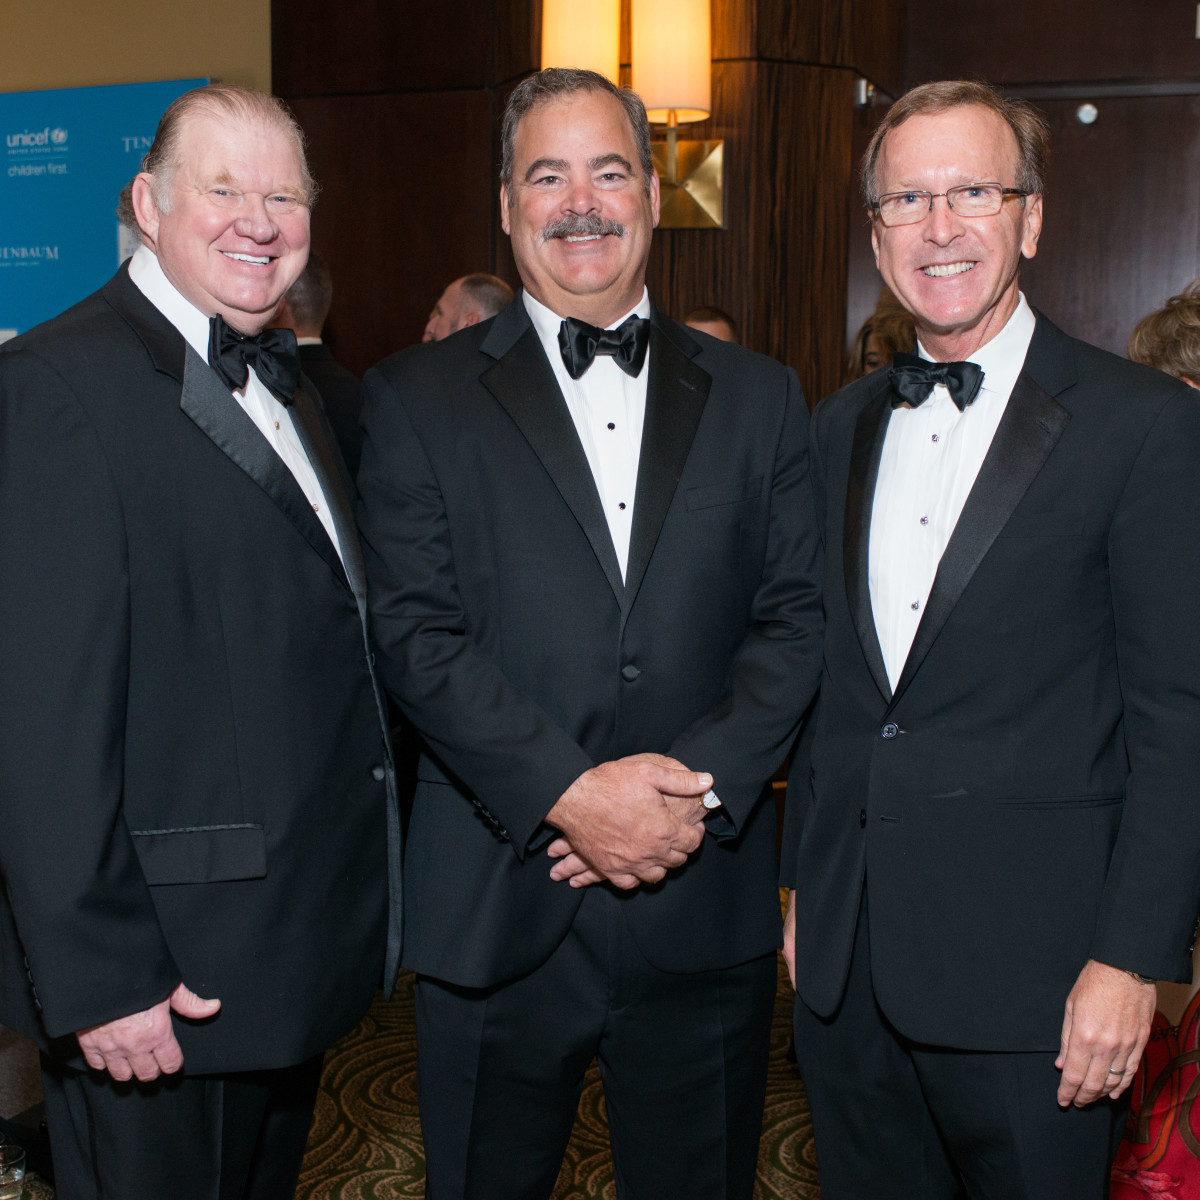 News, Shelby, UNICEF gala, Nov. 2015, Paul Somerville, Cal McNair, Neil Bush